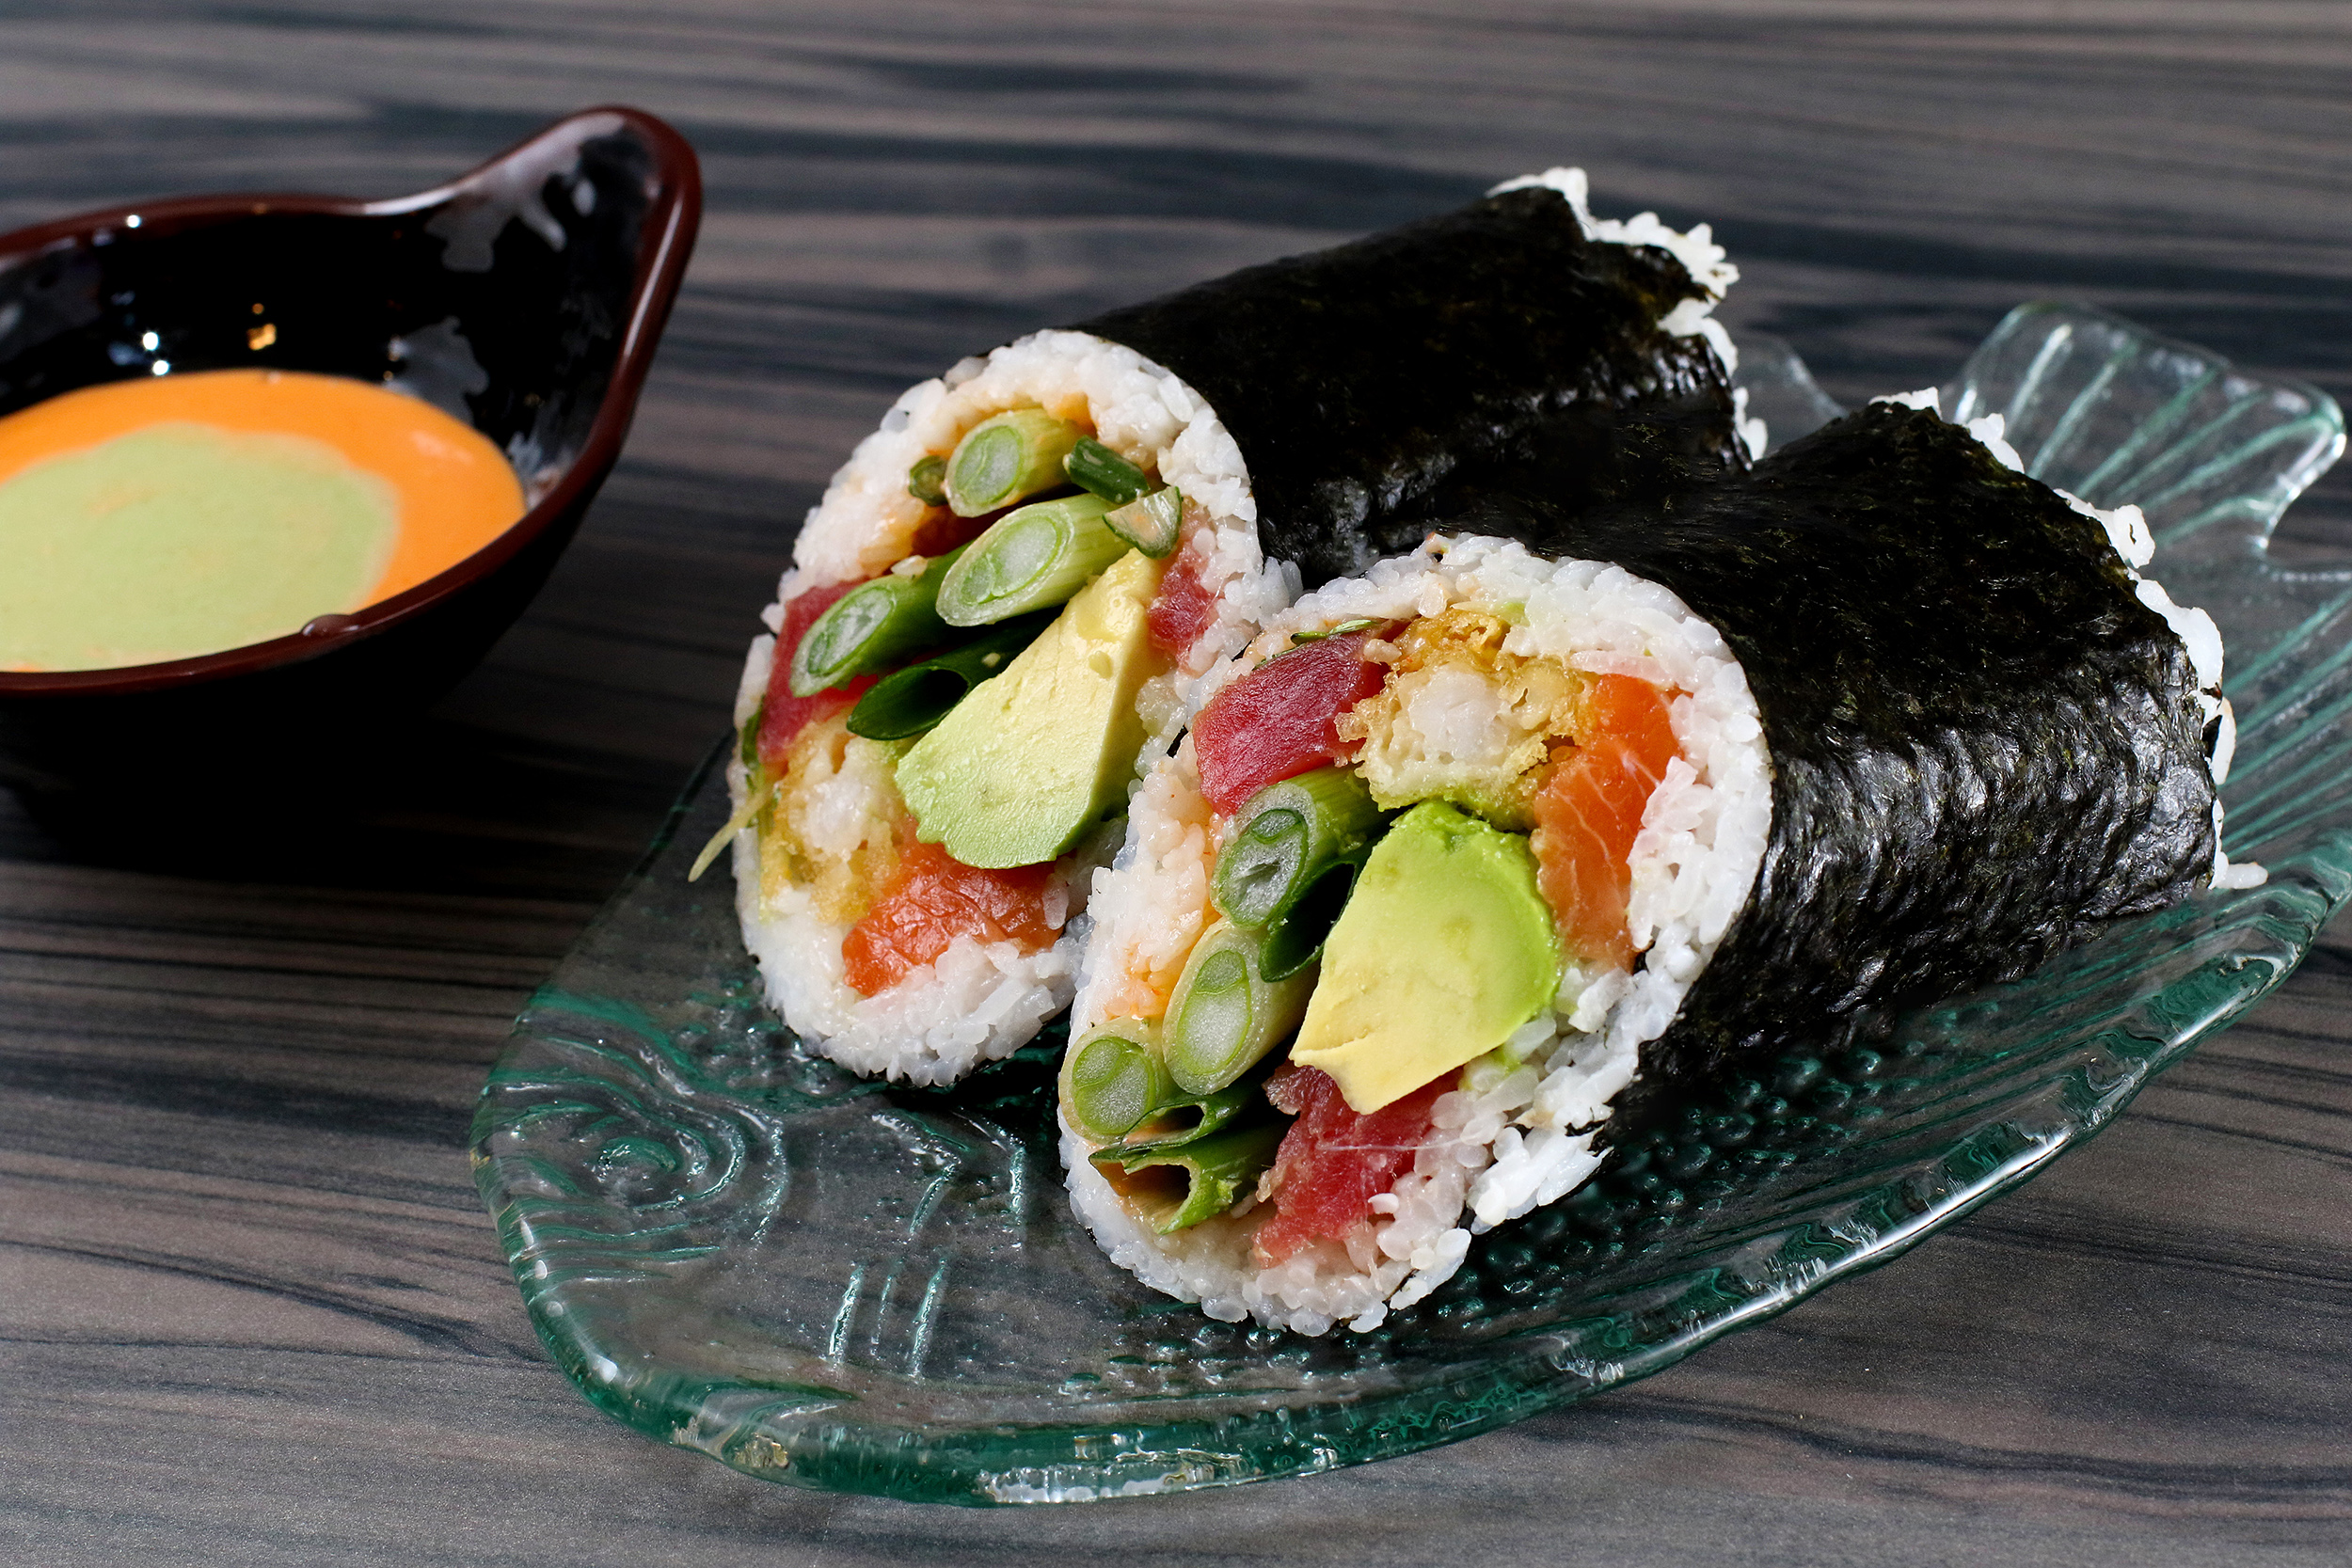 Sushi Burrito with Tuna and Avocado